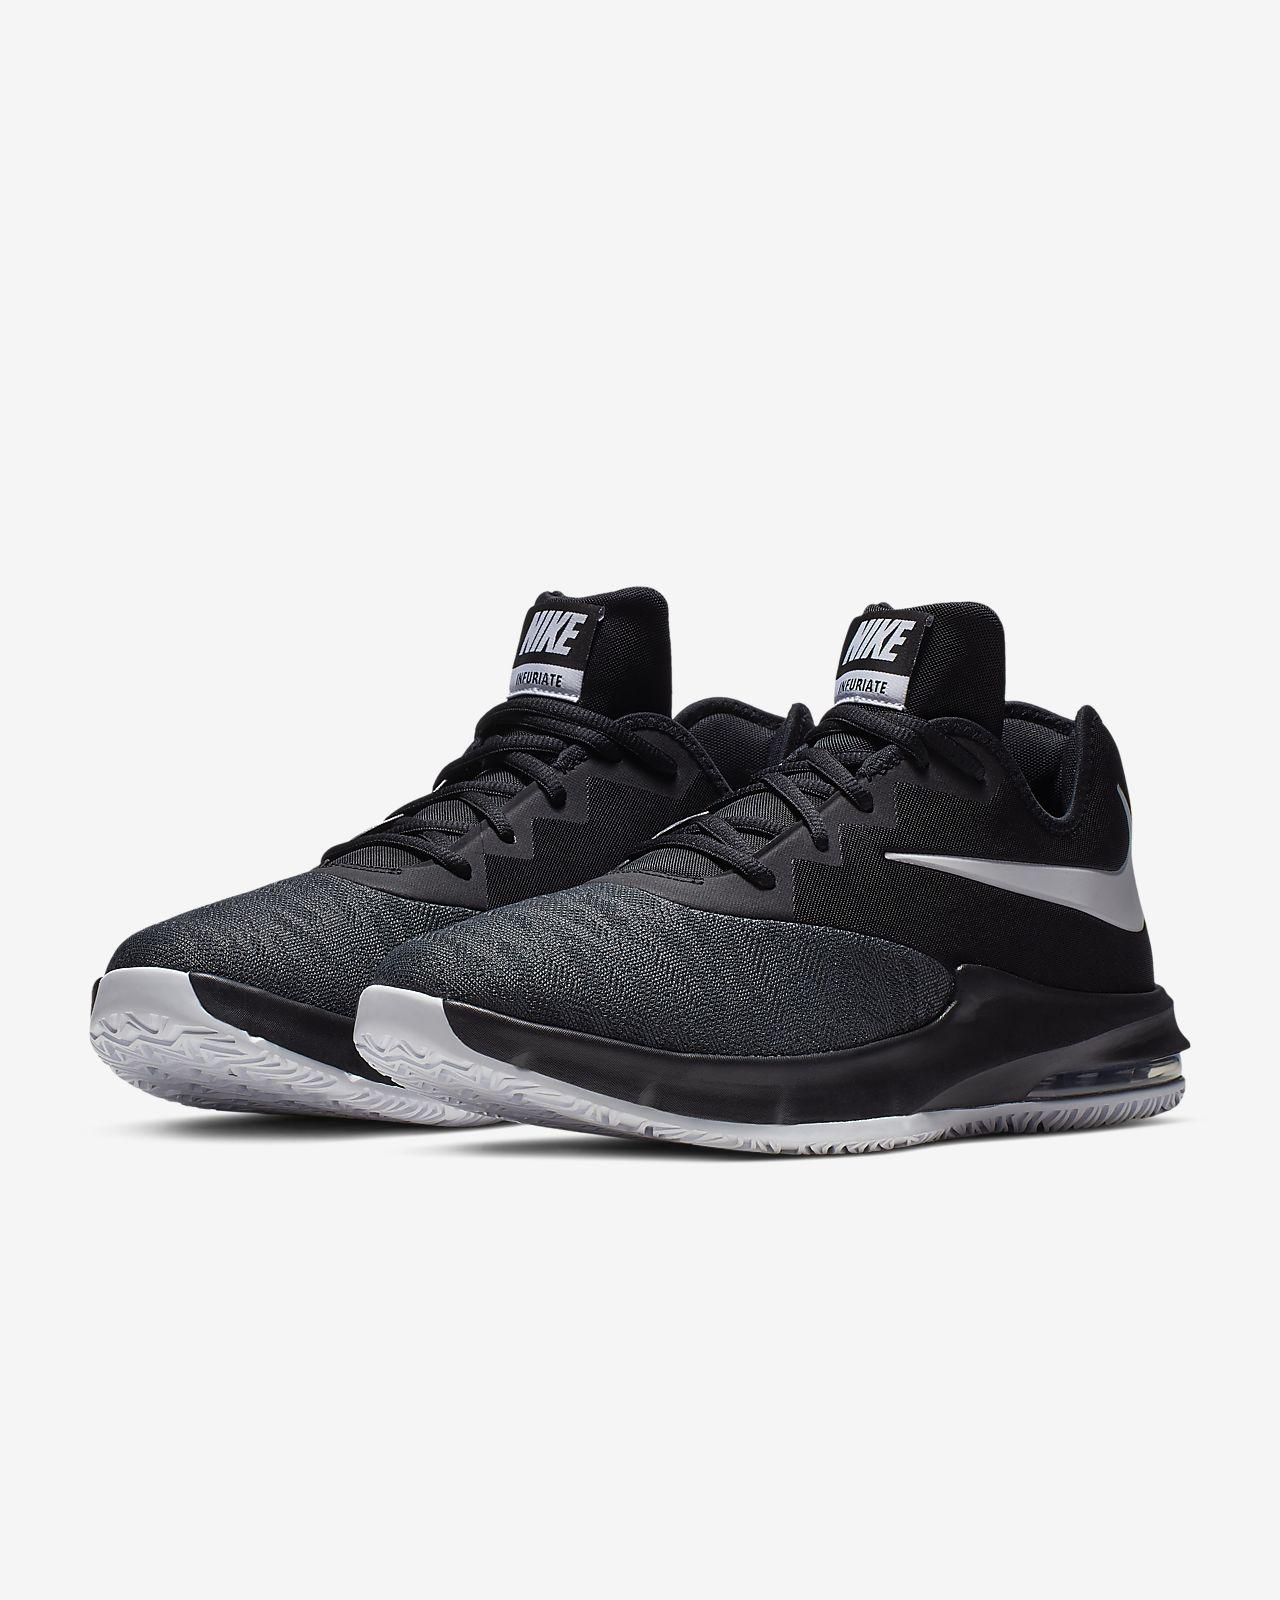 97300430b5fd Nike Air Max Infuriate III Low Men s Basketball Shoe. Nike.com